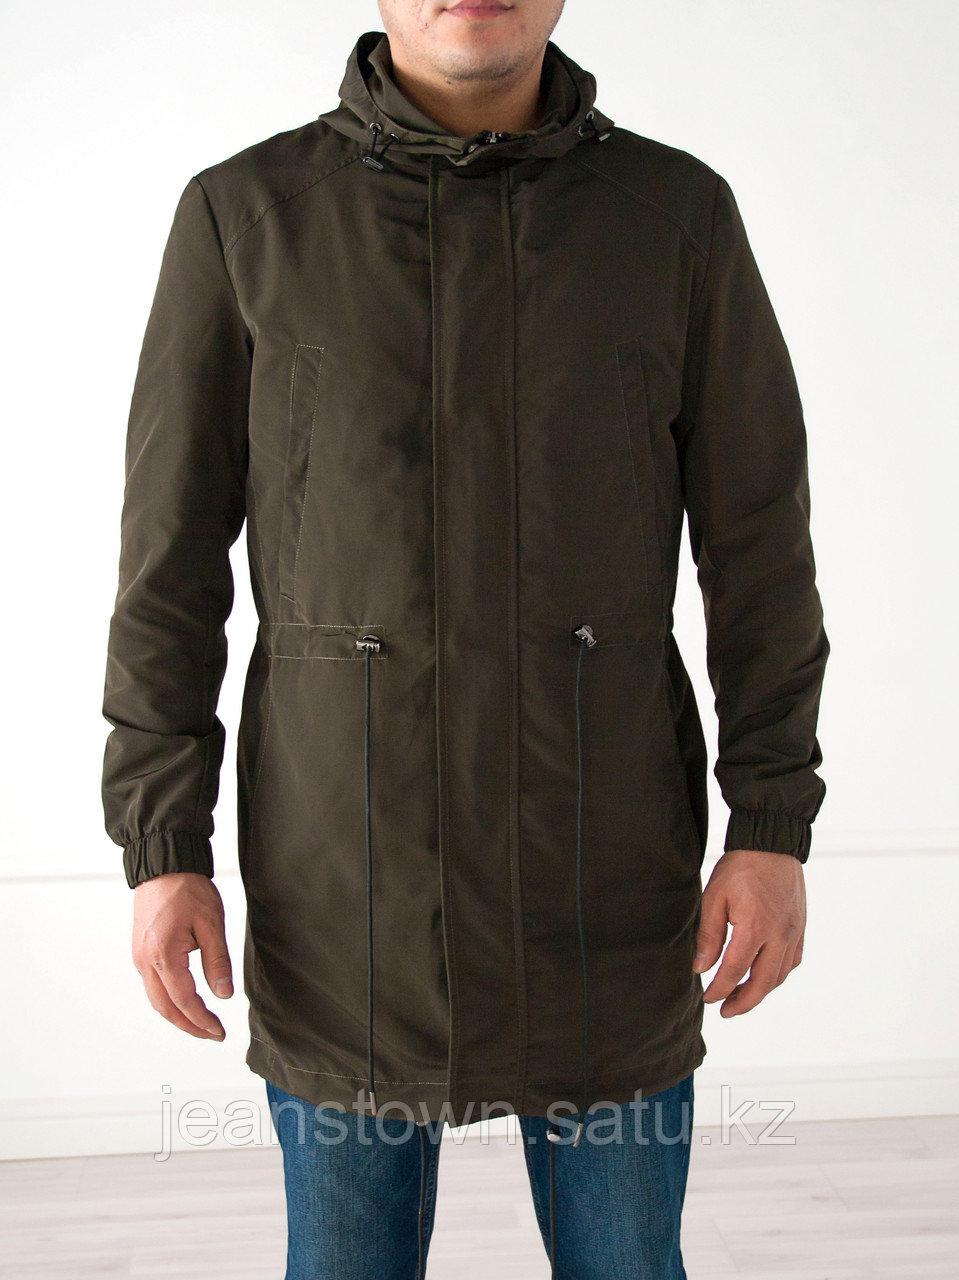 Куртка- парка мужская  Vivacana длинная,хаки